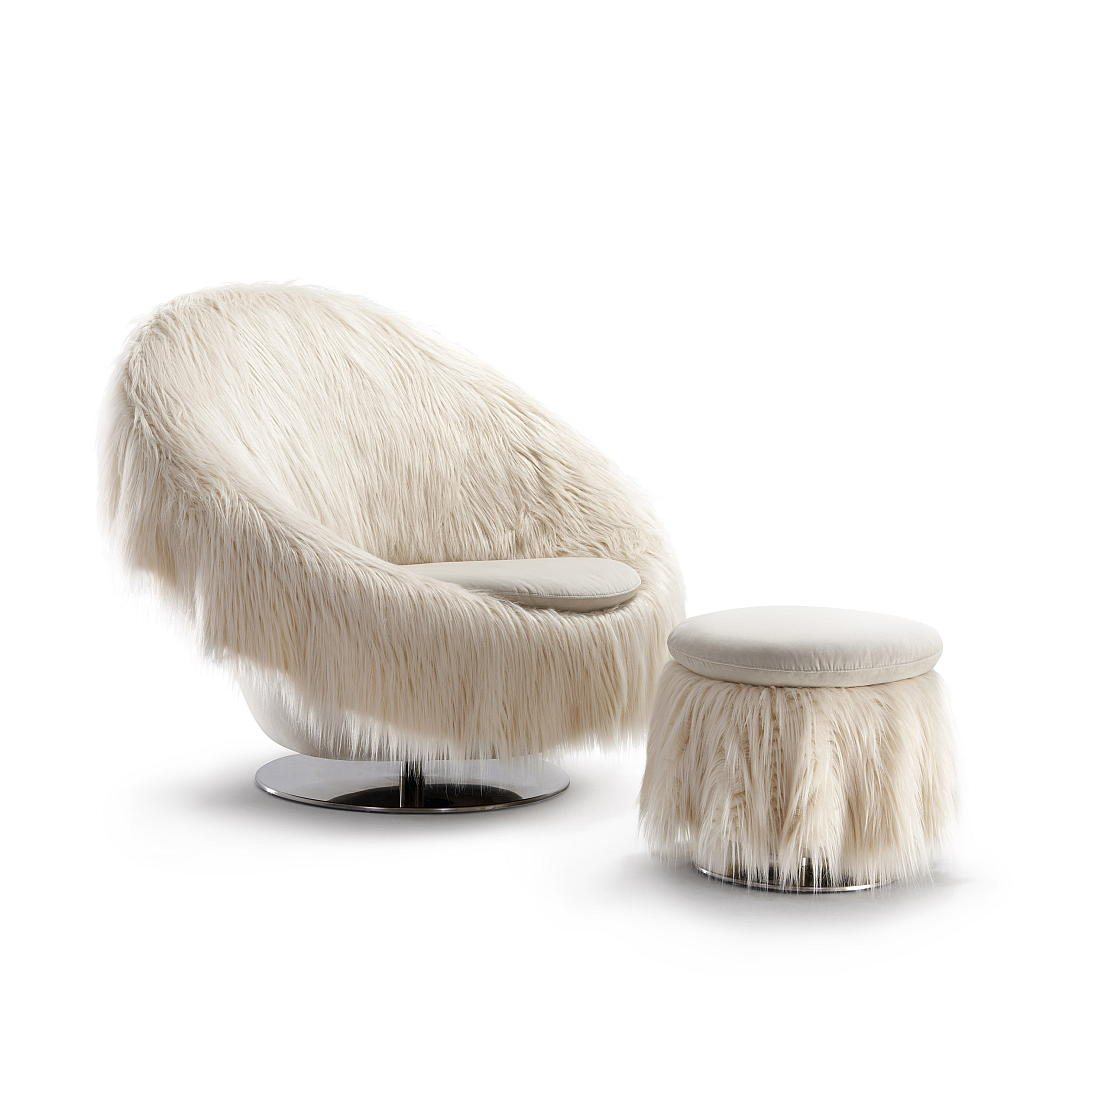 BIG EASY Sessel, drehbar, mit Fellüberwurf